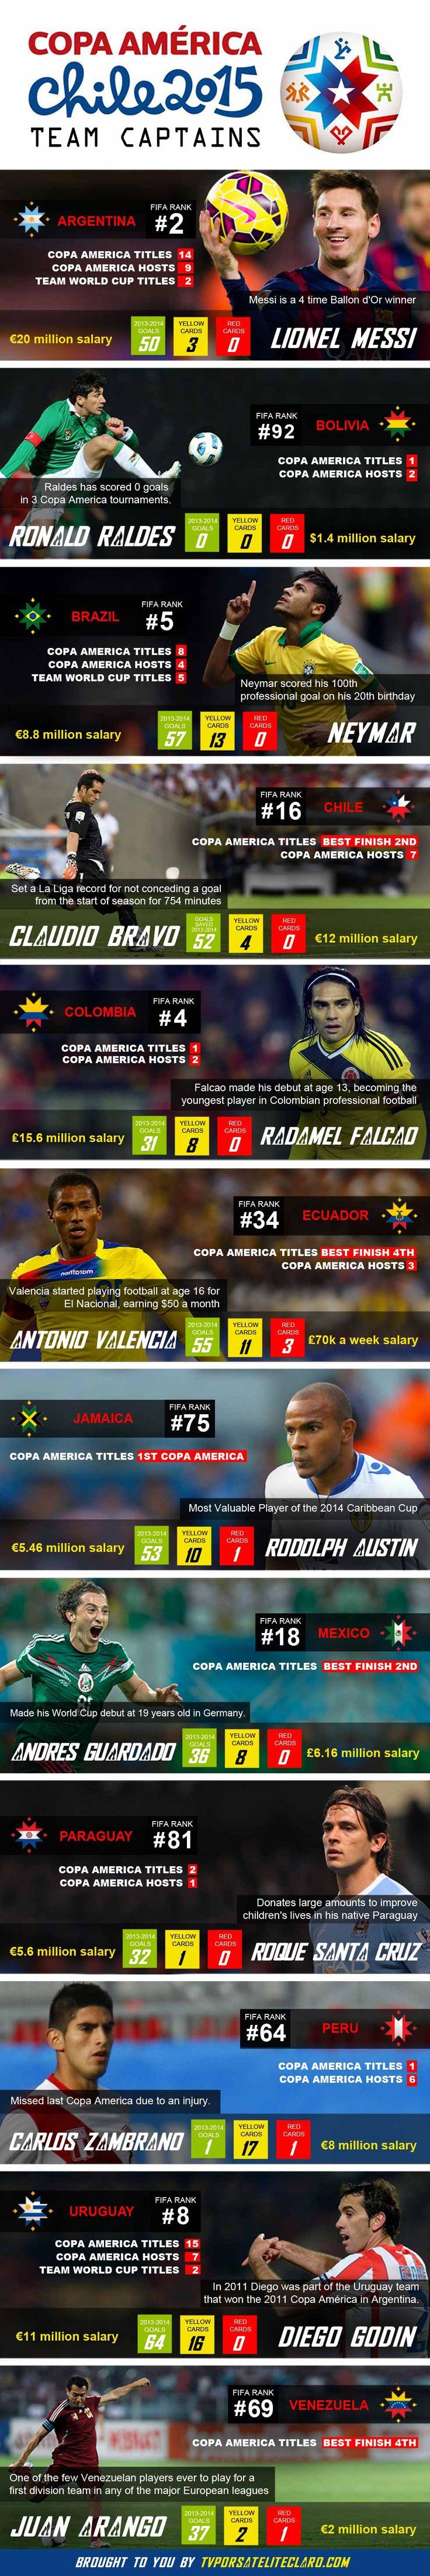 Copa America 2015 - Team Captains - Do you fancy an infographic?  There are a lot of them online, but if you want your own please visit http://www.linfografico.com/prezzi/  Online girano molte infografiche, se ne vuoi realizzare una tutta tua visita http://www.linfografico.com/prezzi/